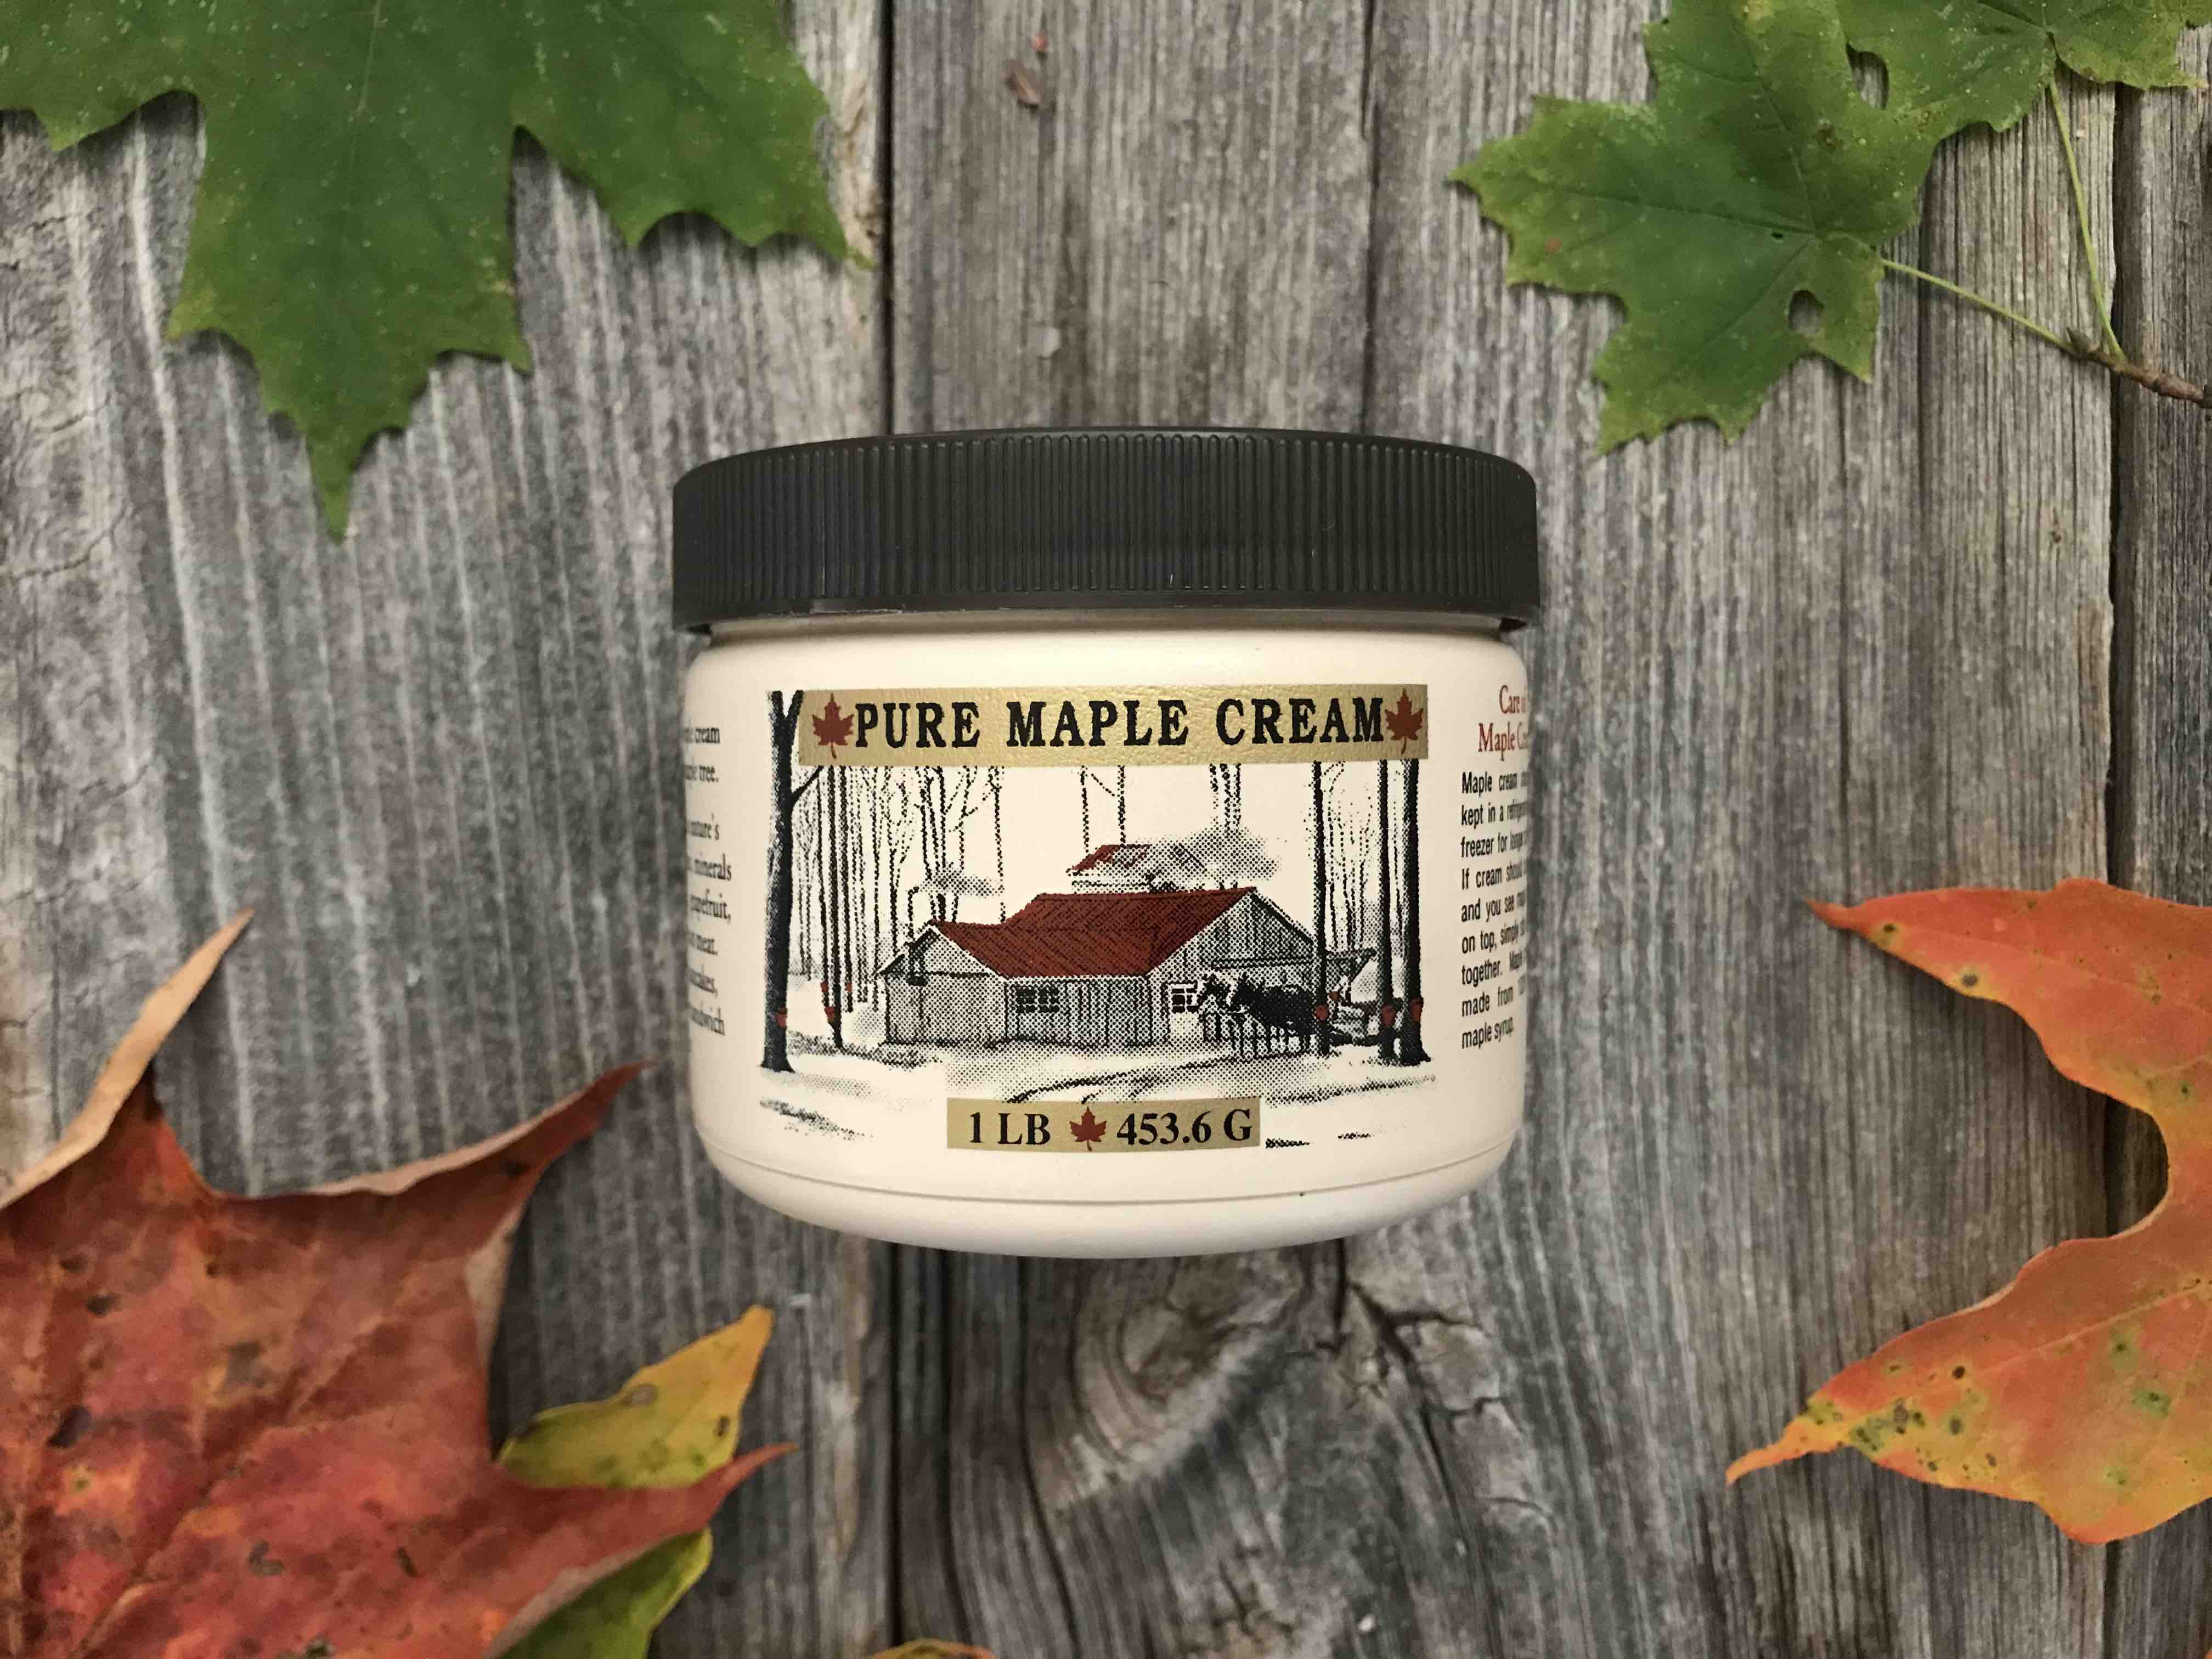 1 Pint - Maple Cream